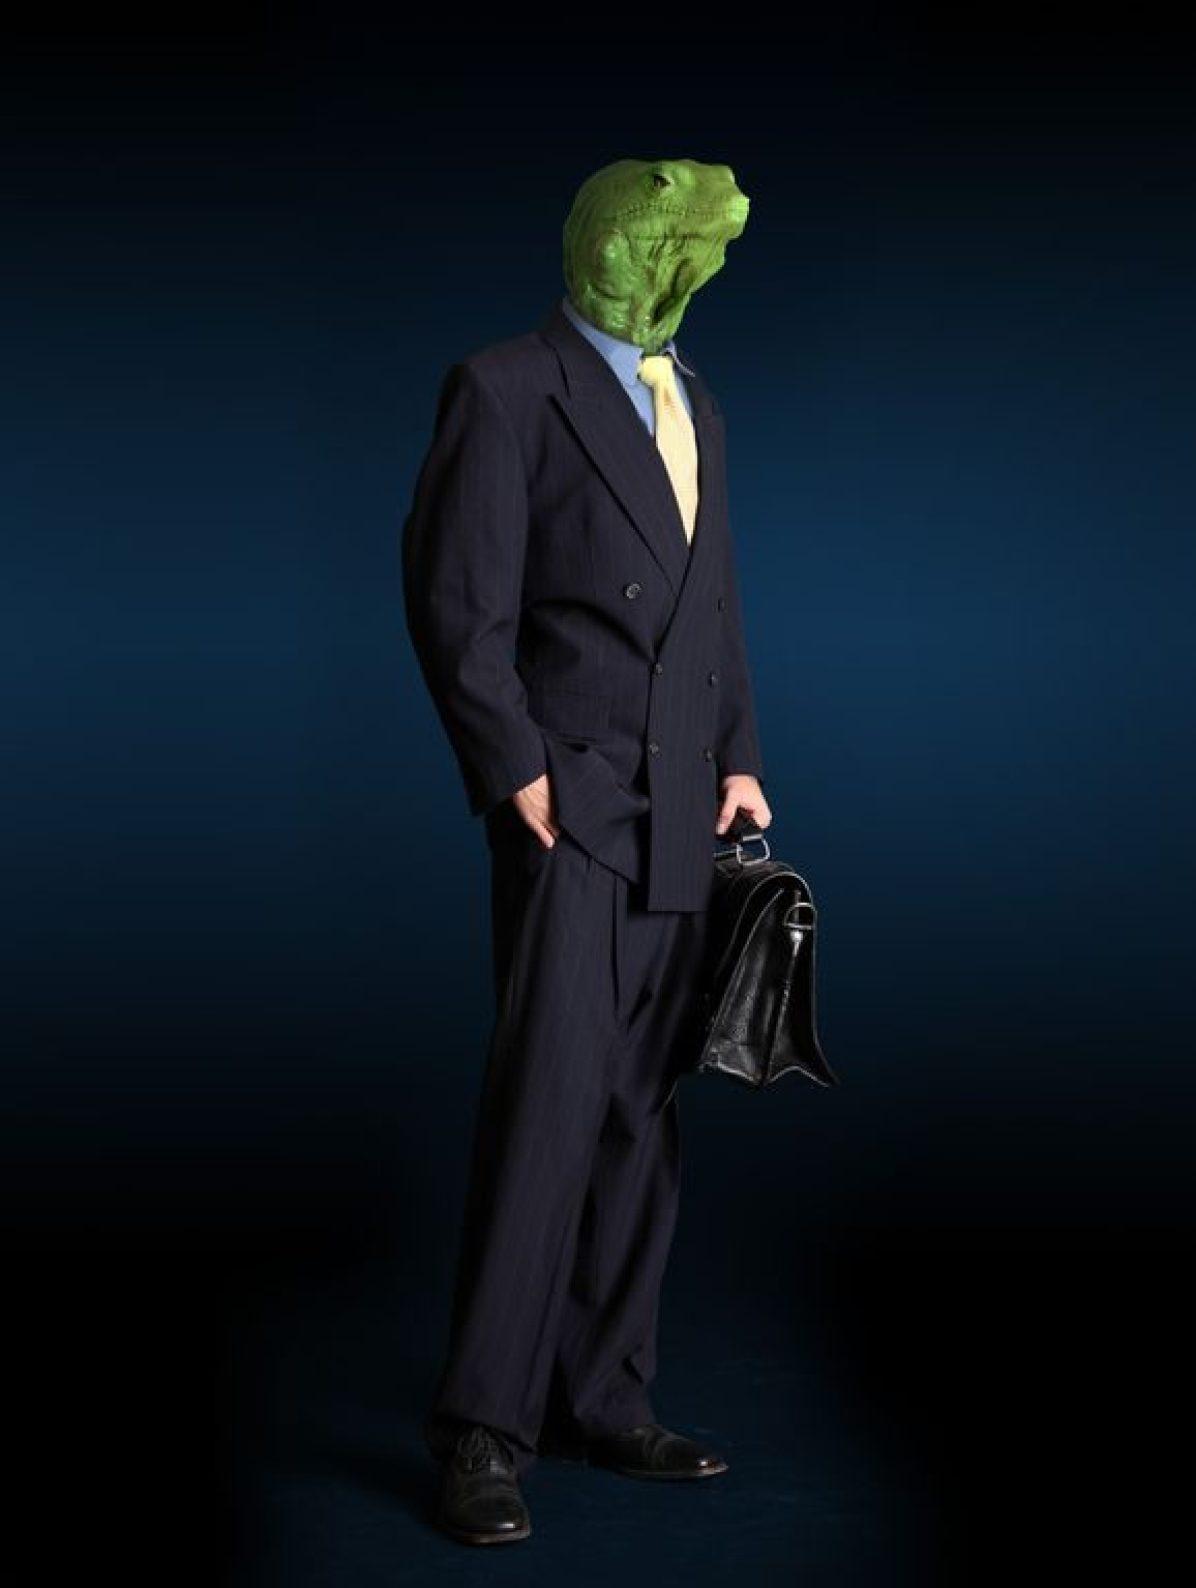 businessman business Animal ReptileHead Datei: #51175972 | Urheber: Gunnar Assmy @fotolia.com